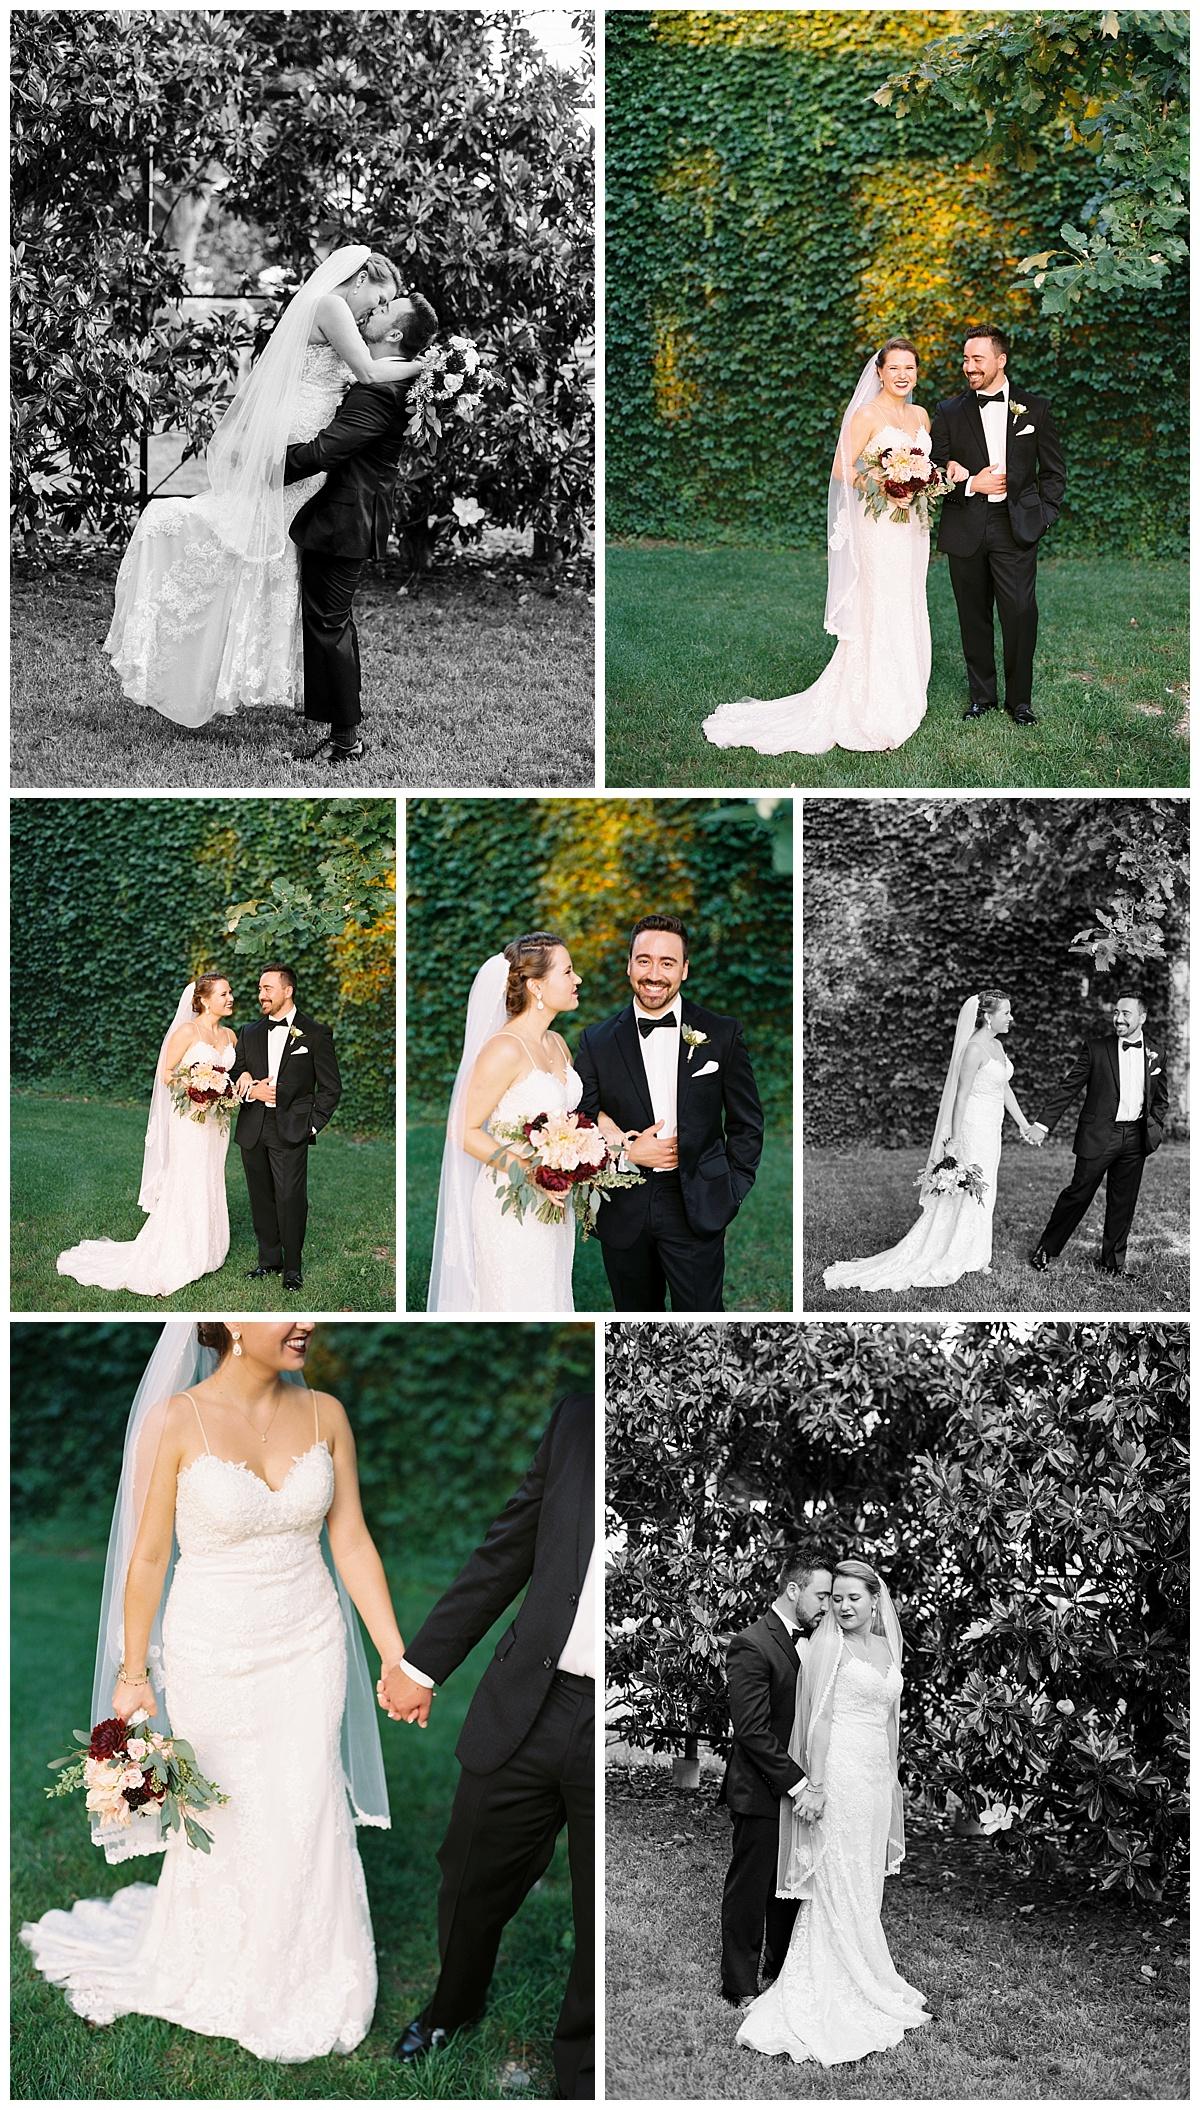 hickory-stree-annex-wedding-ar-photography-nicole-nolan-16.jpg